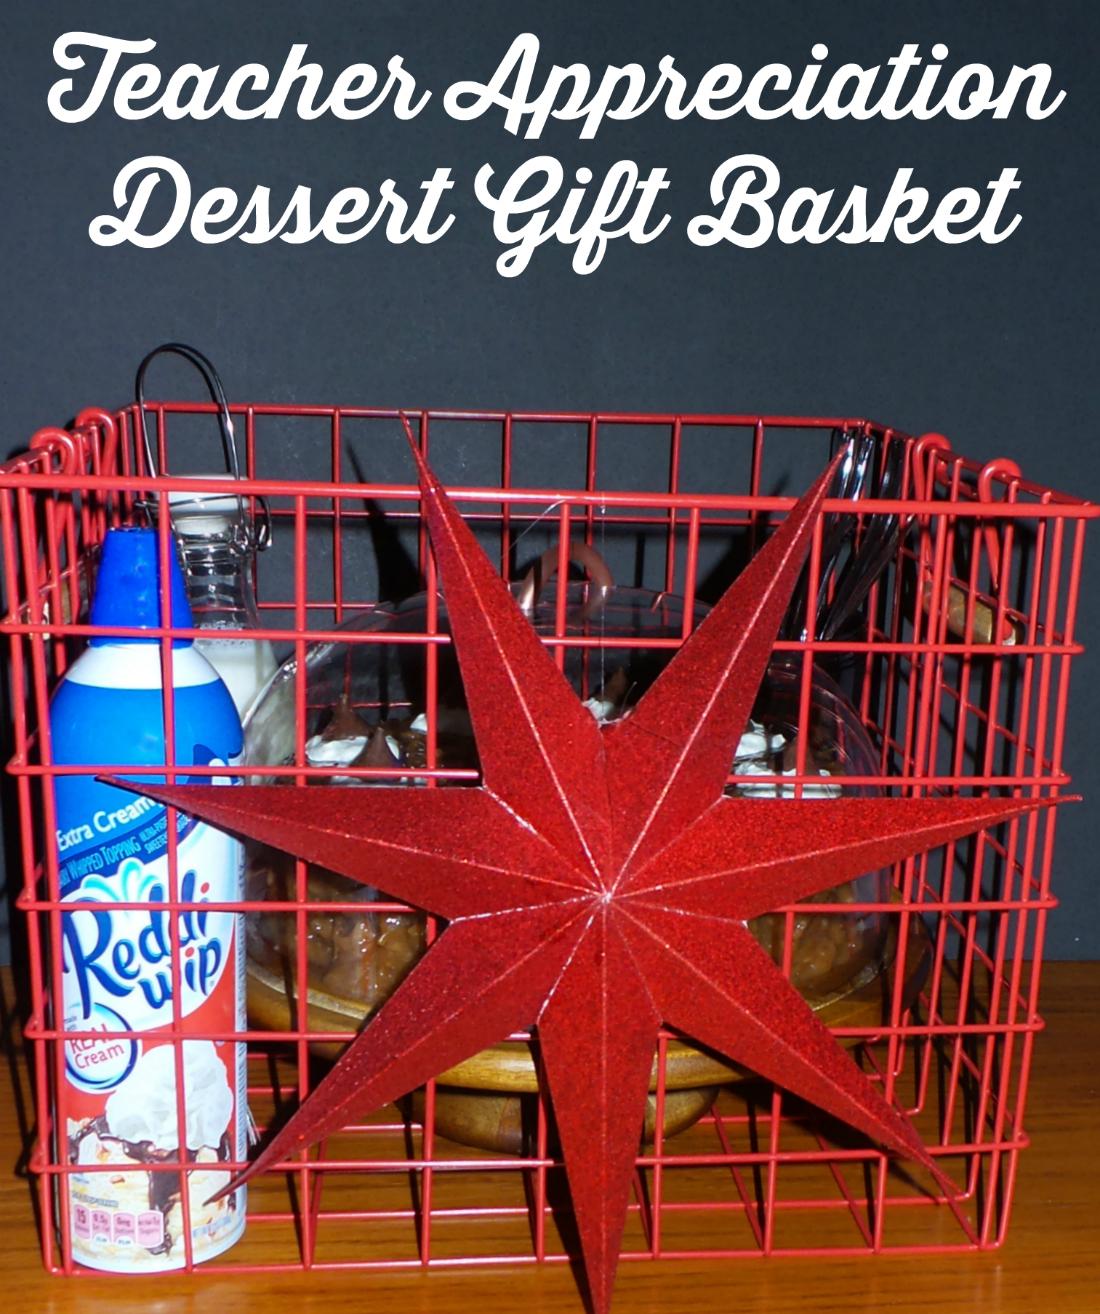 teacher appreciation dessert gift basket